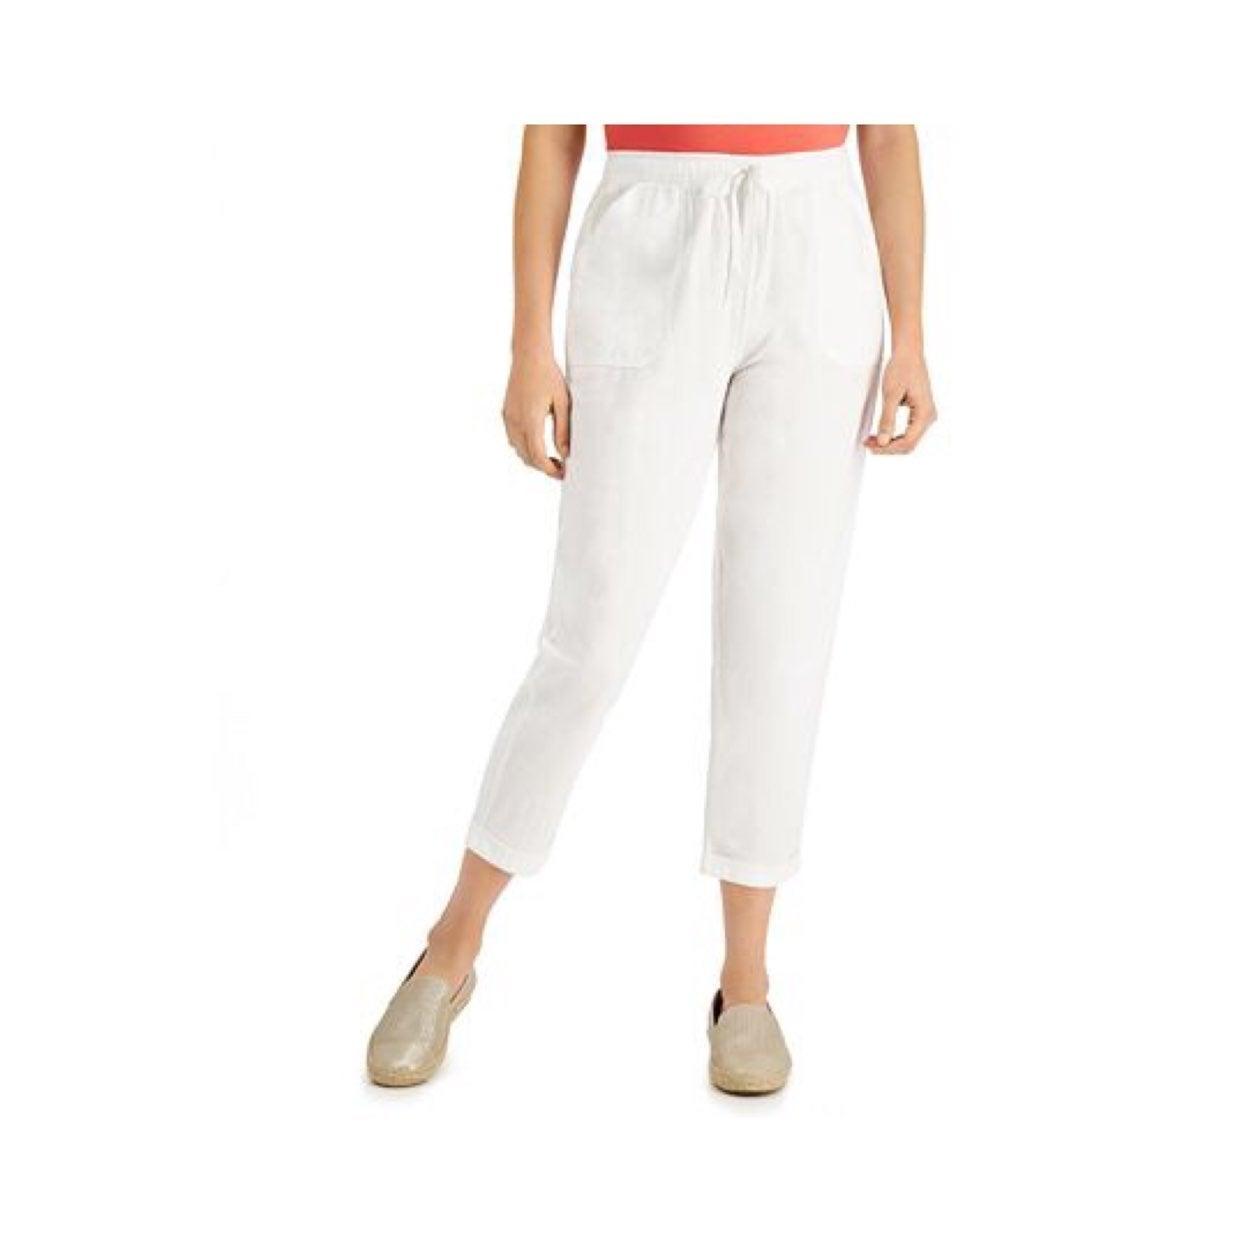 *Karen Scott Cotton Pull-On Capri Pants